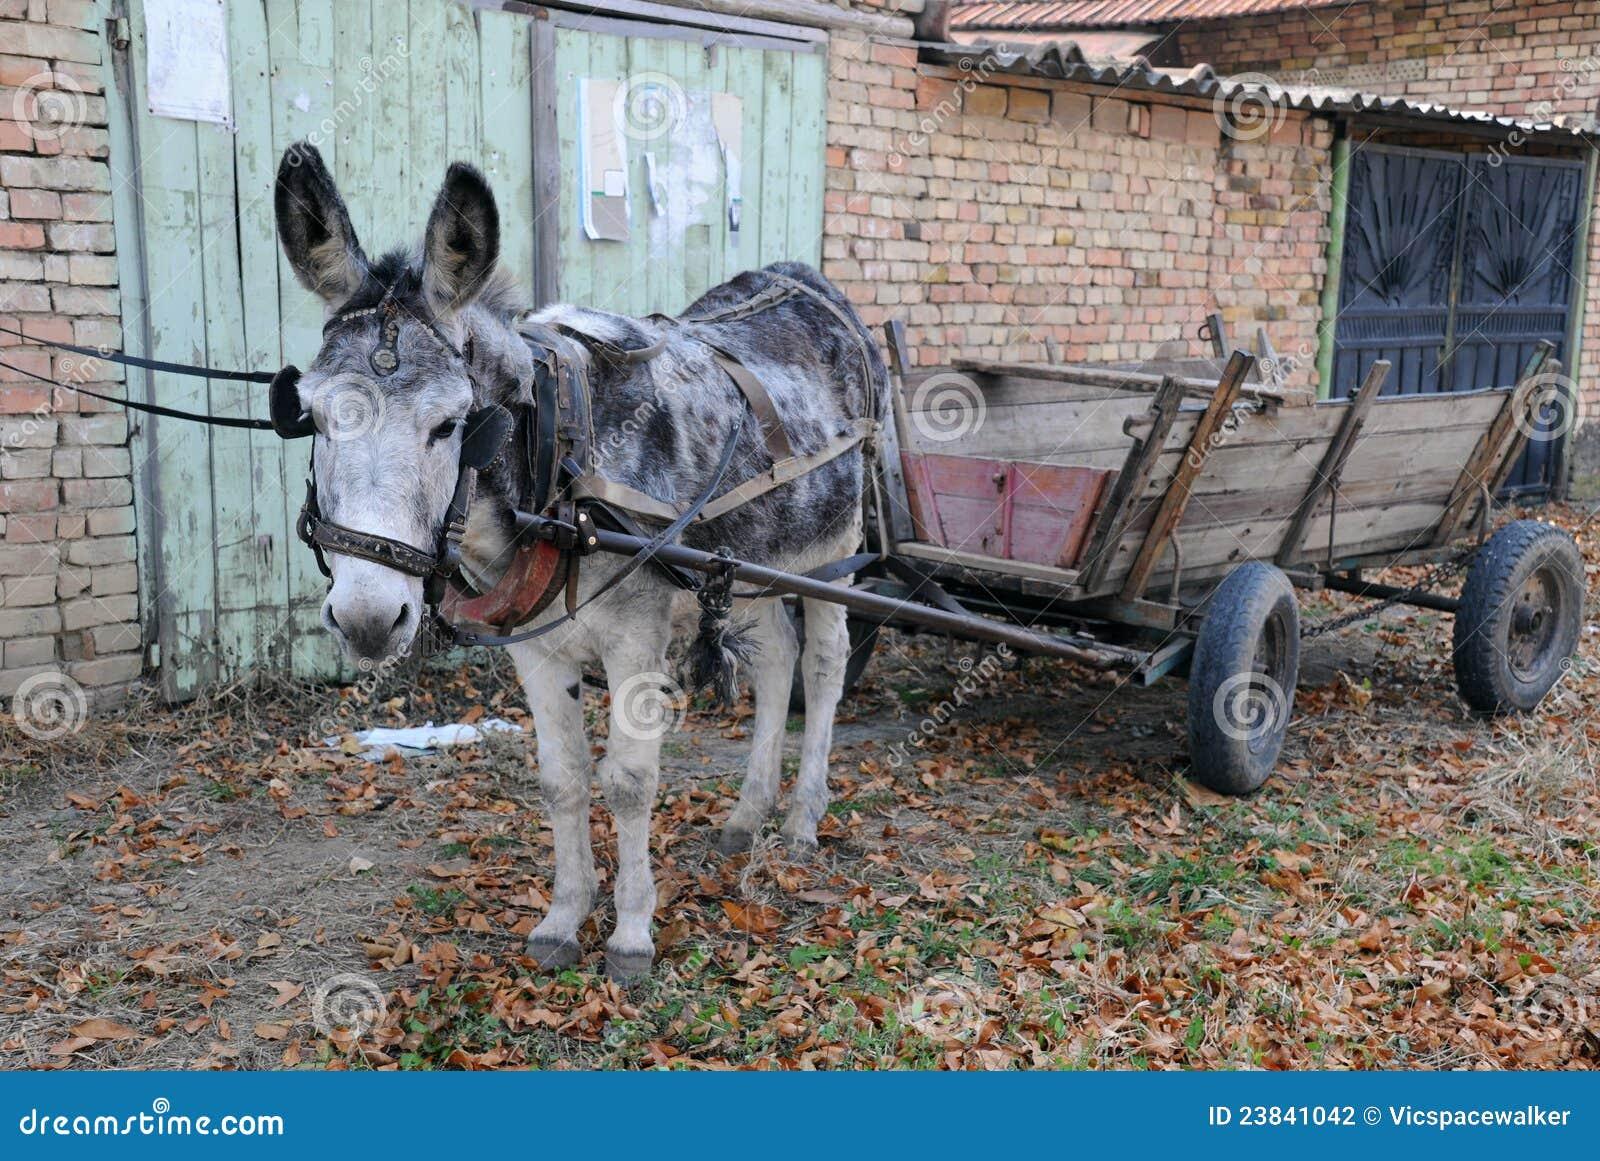 Gray Donkey And Empty Cart Stock Photography Image 23841042